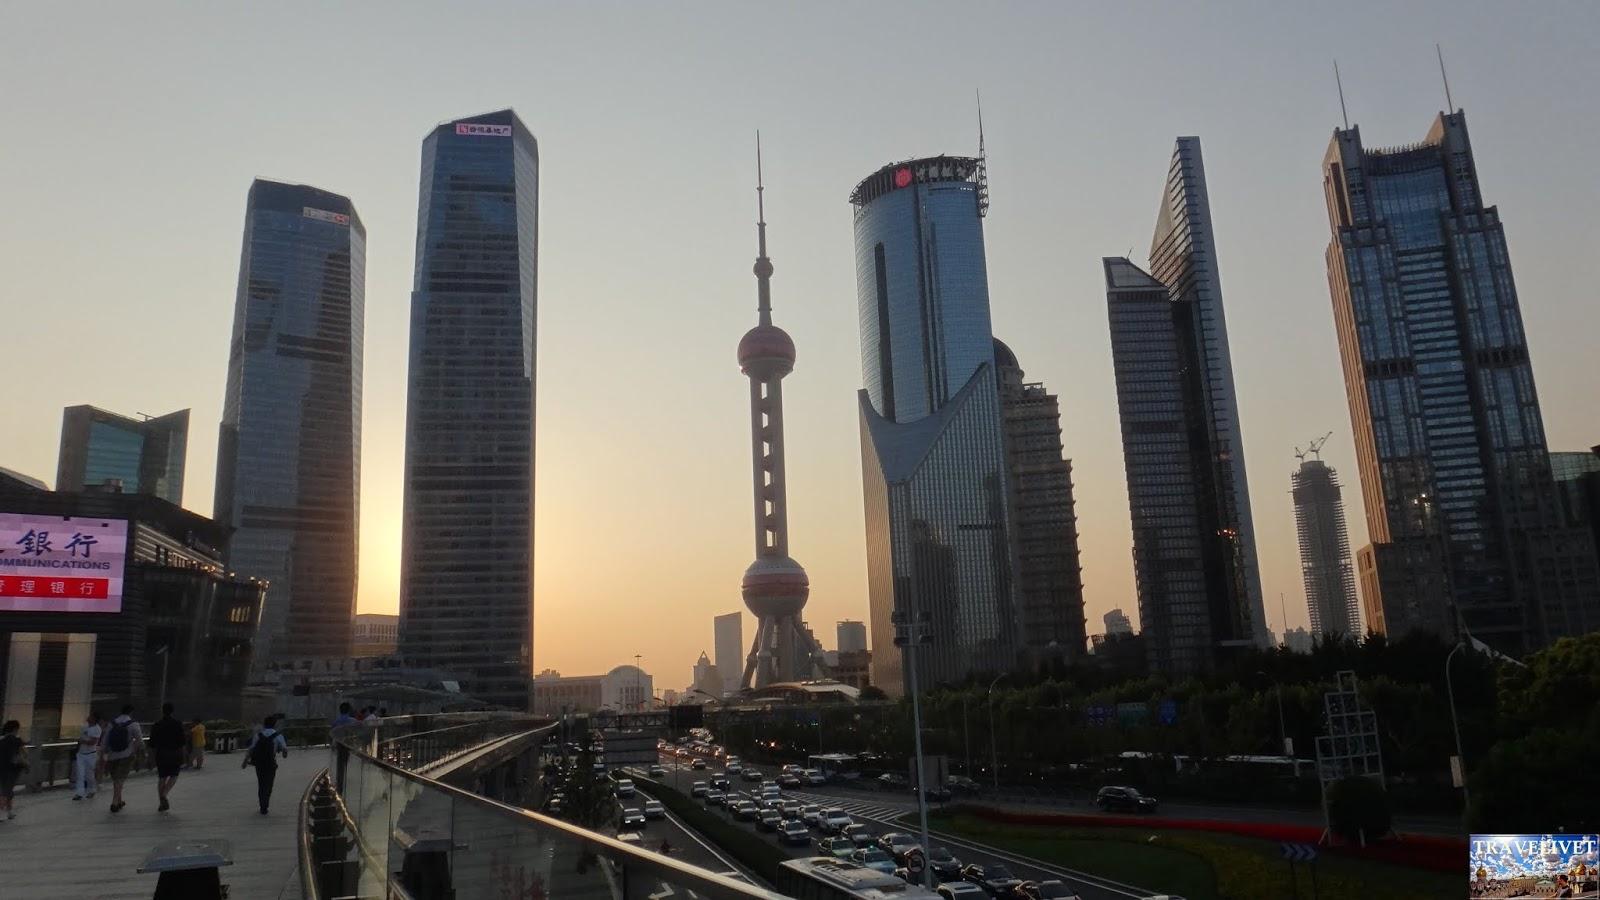 Shanghai Chine China Pudong